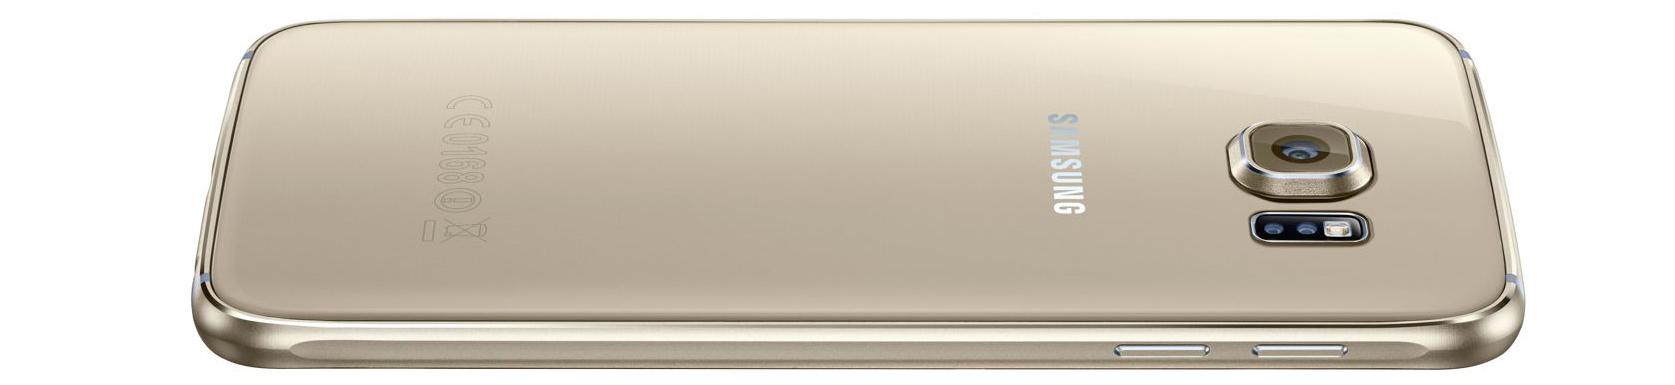 Equipo Samsung S6 descripcion back